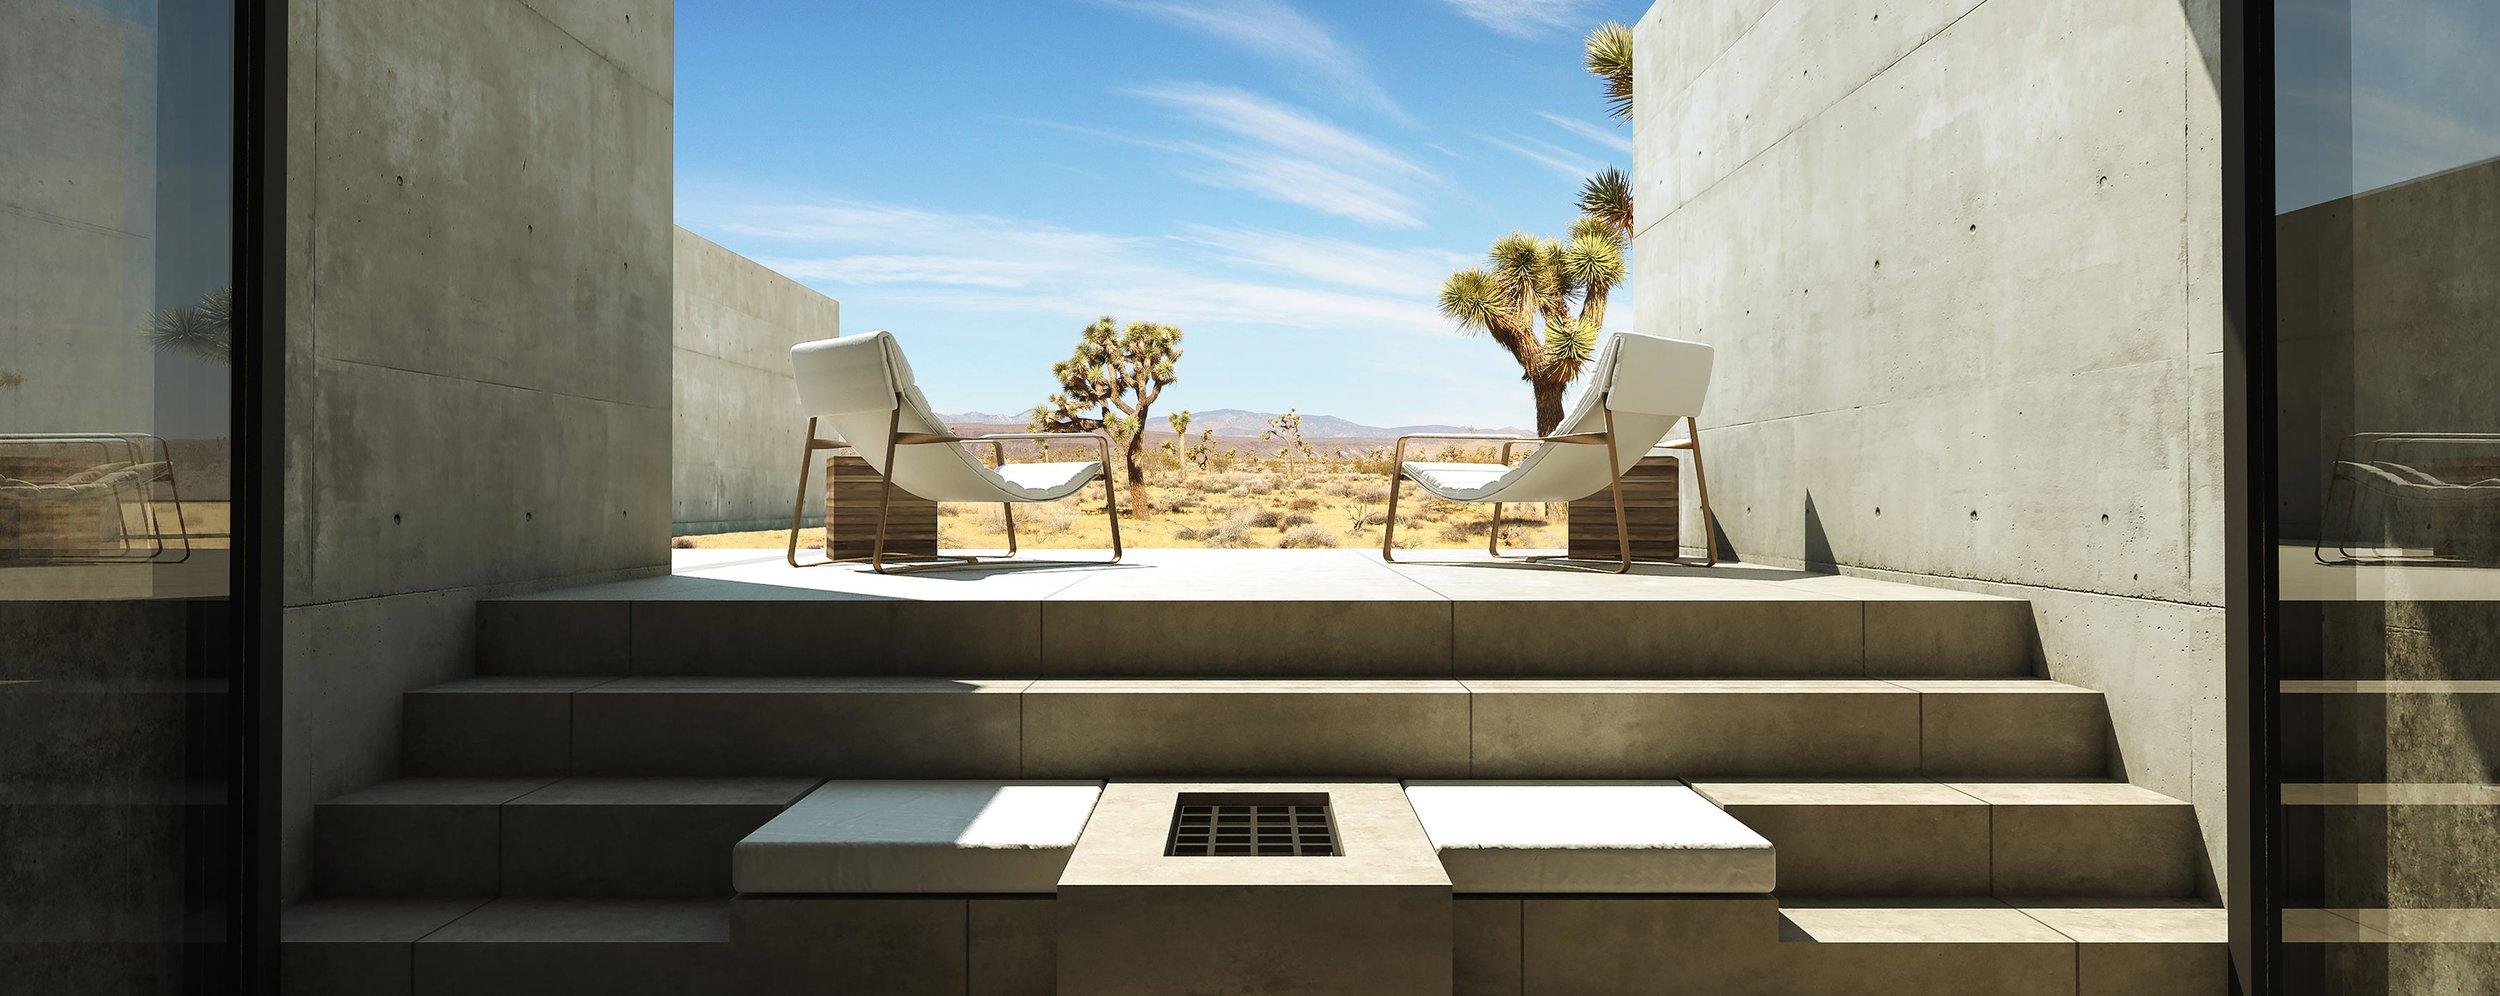 casaplutonia-patio-view-3500-main-banner.jpg